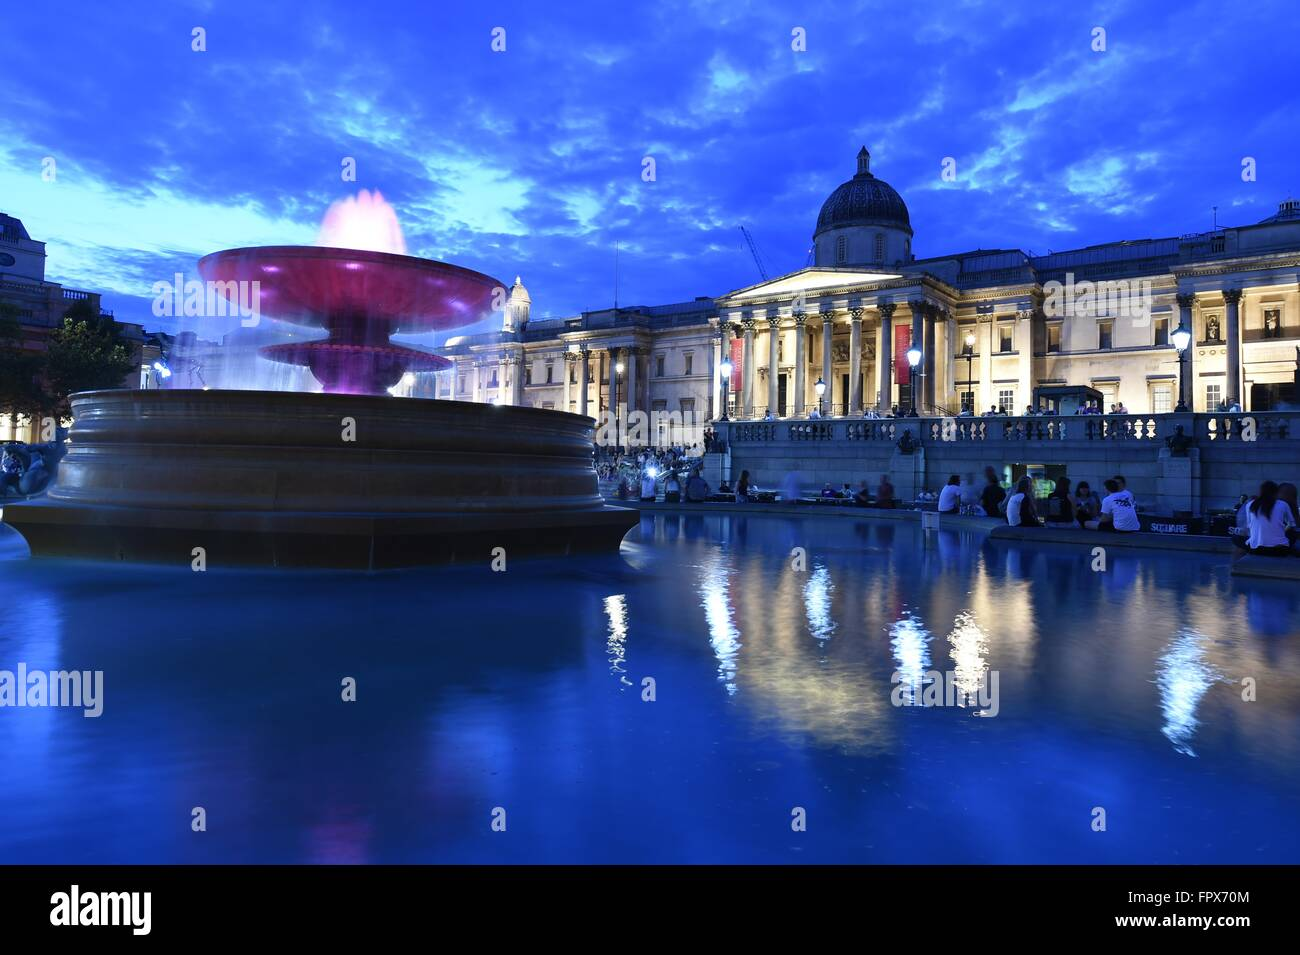 National Gallery, Trafalgar Square, art gallery in London, UK - Stock Image